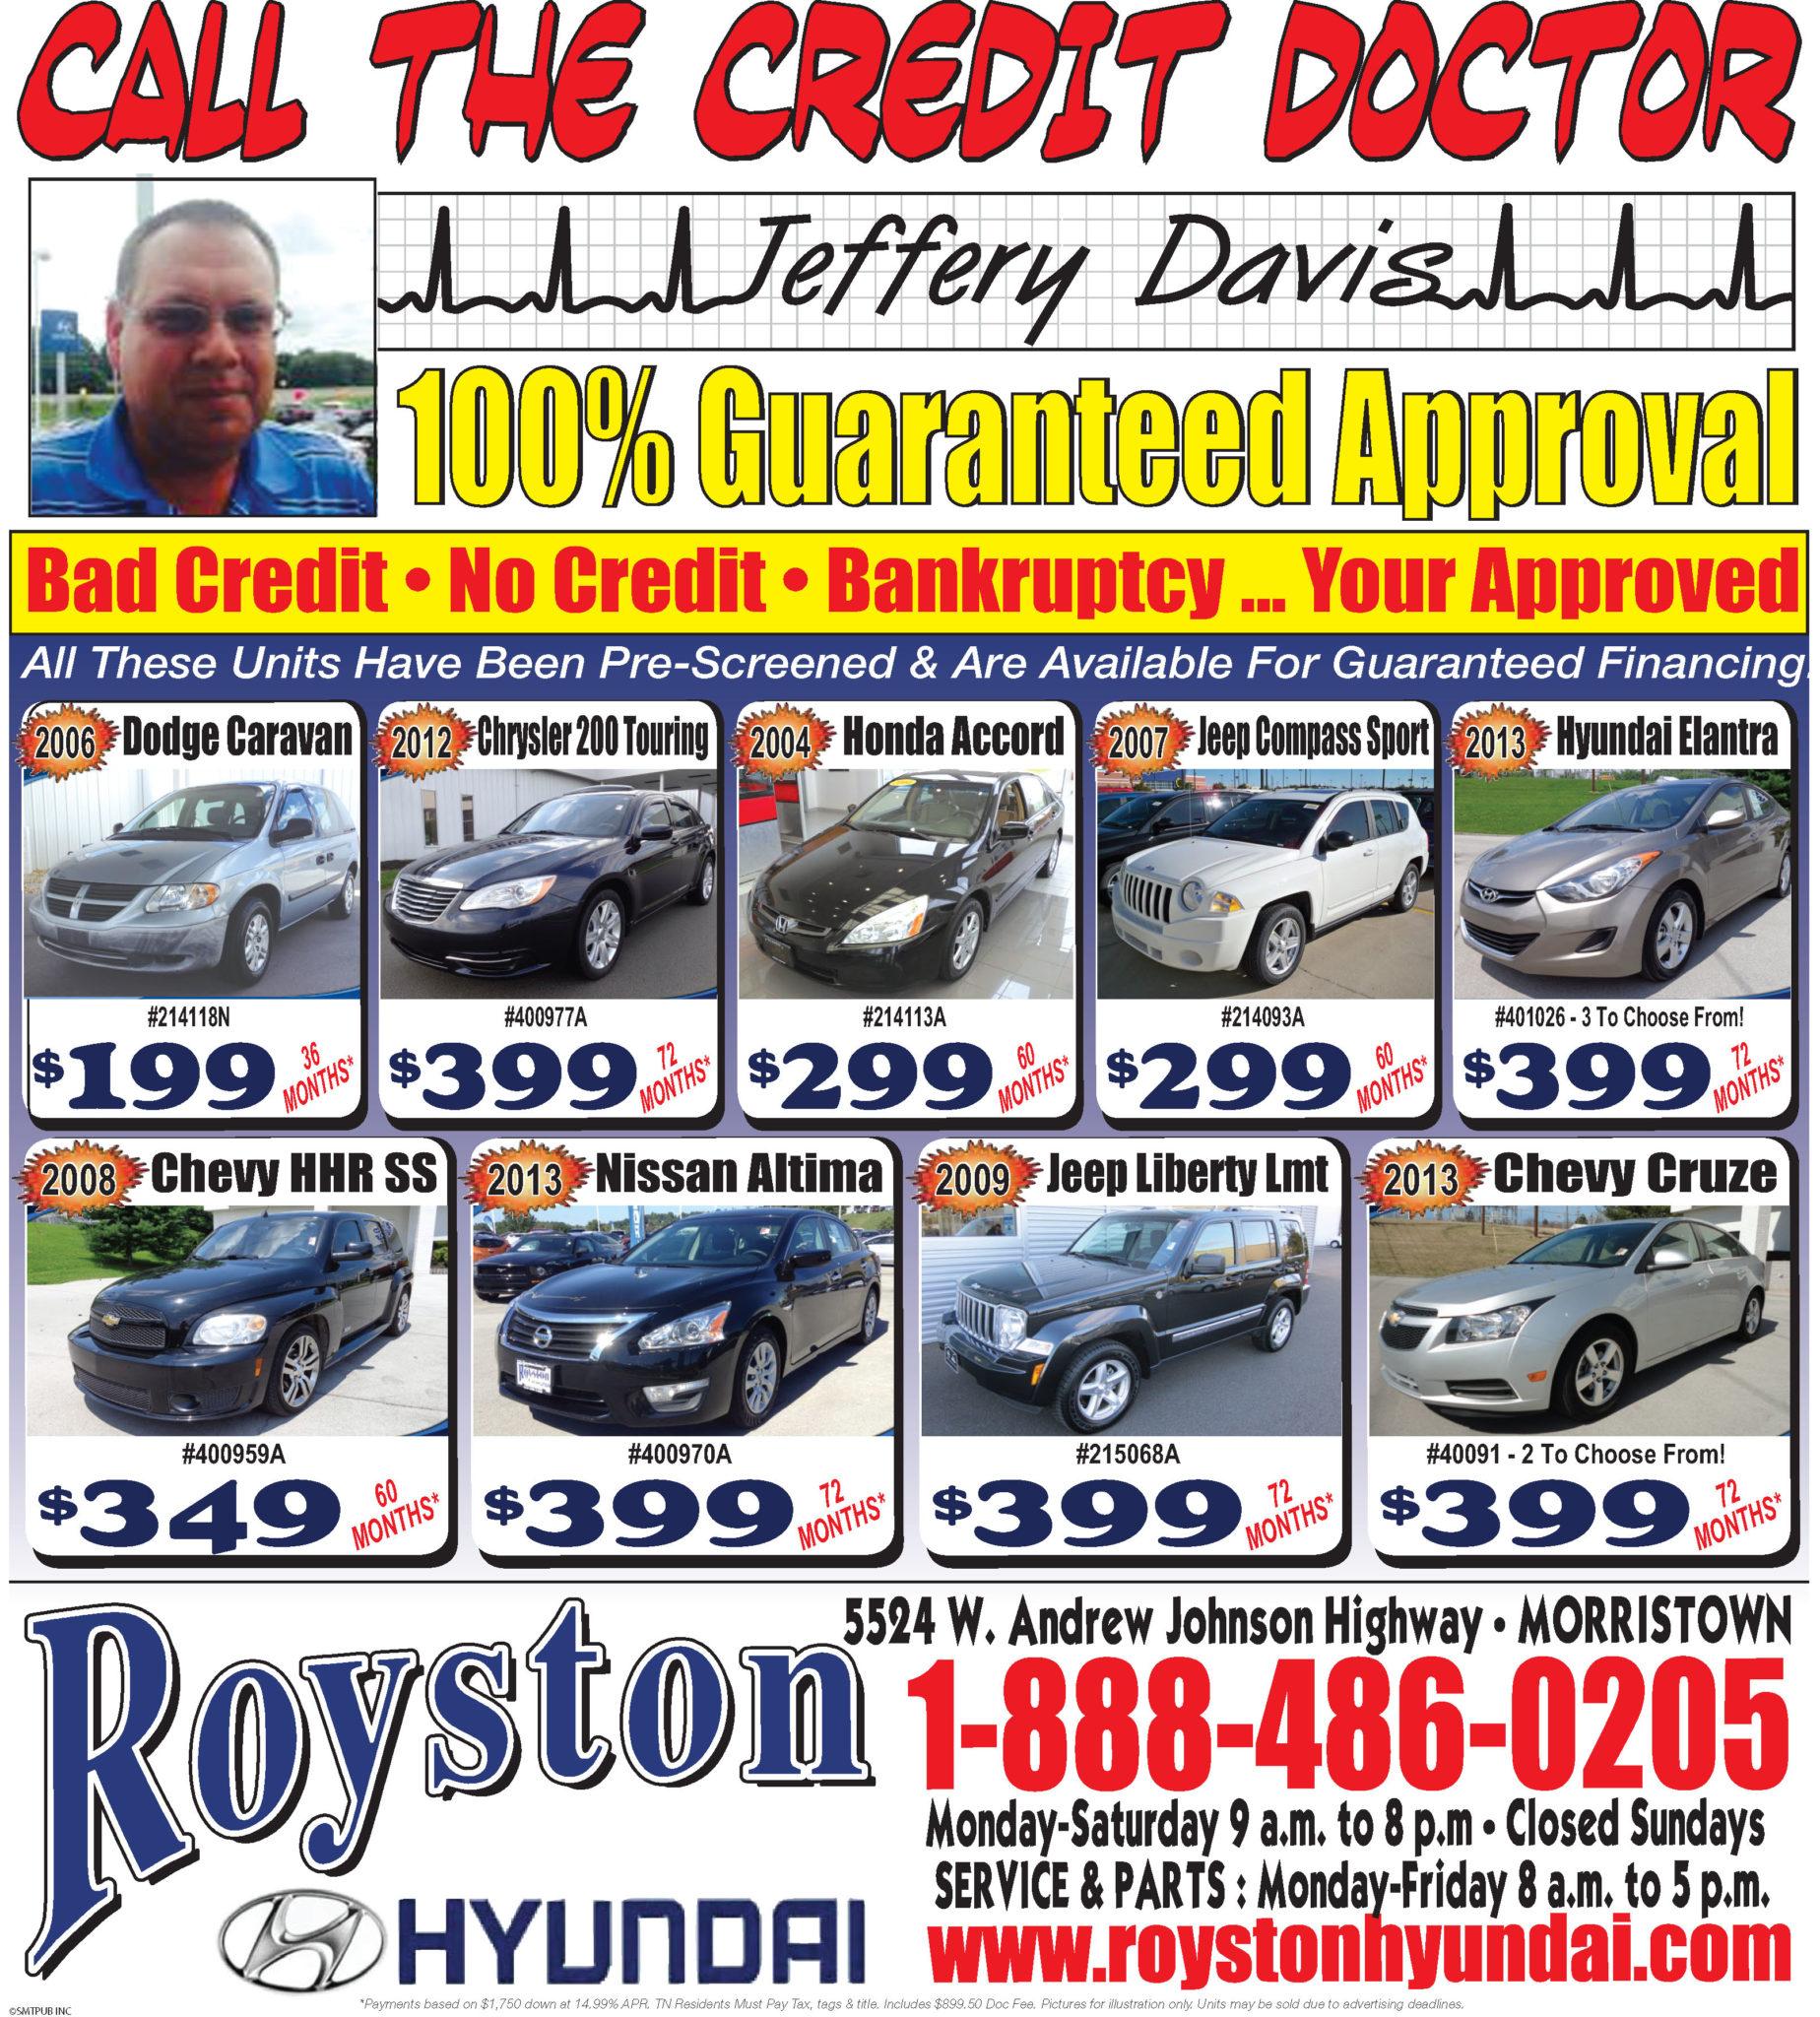 Royston Hyundai Ad